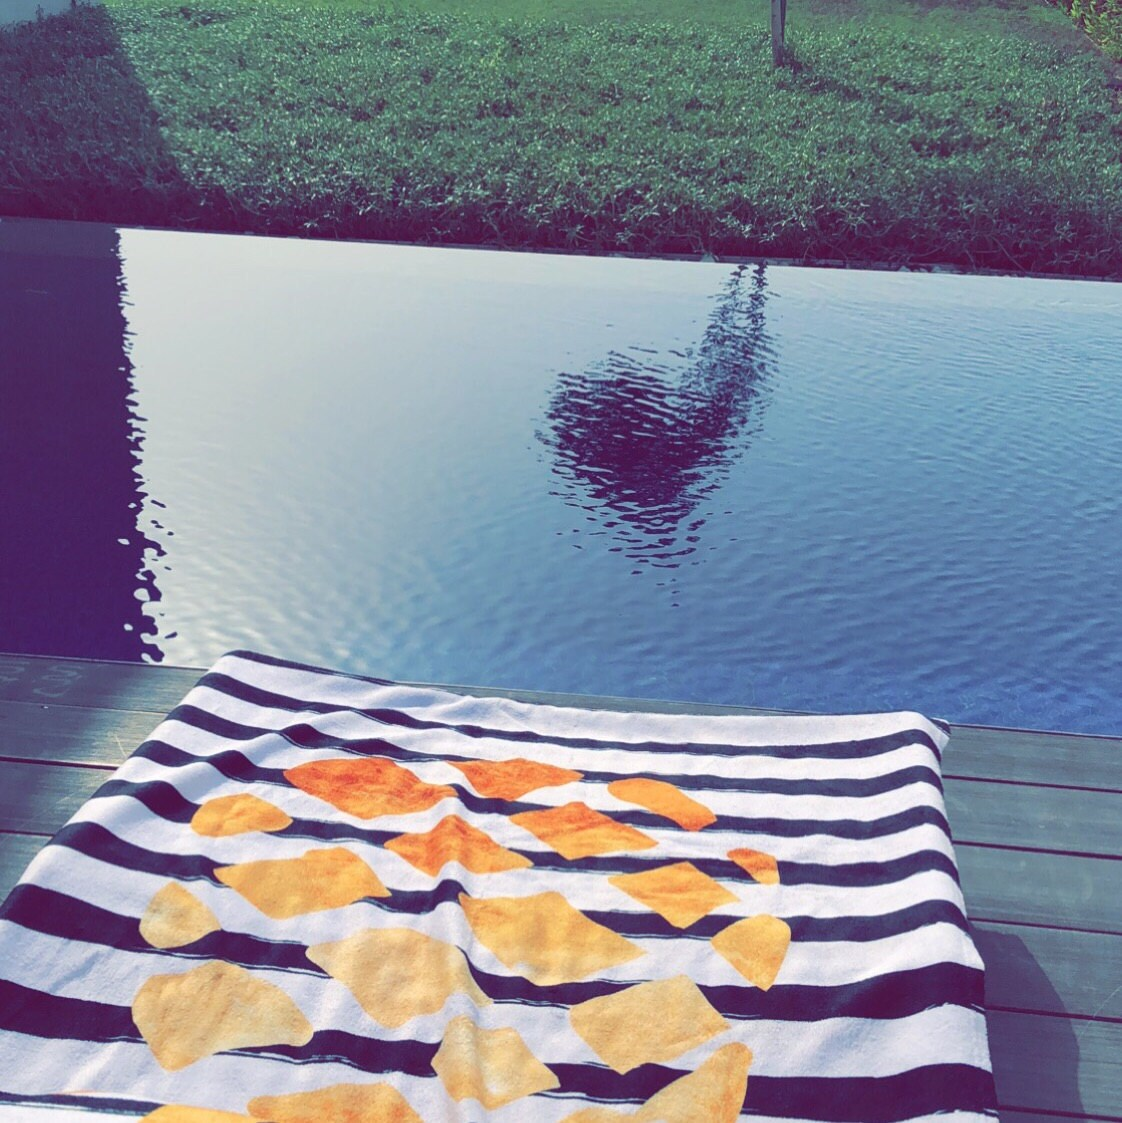 Beach Towel Bundle: Pineapple And Stripes